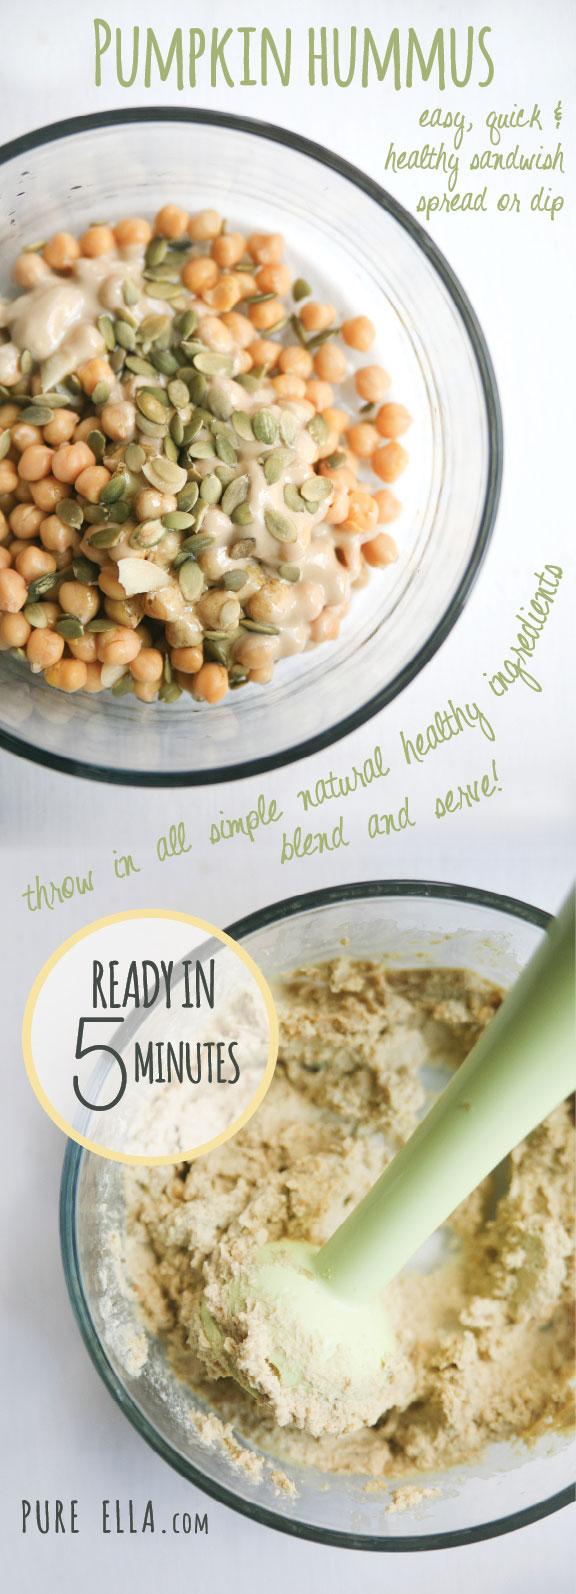 Pure-Ella_-Ella-Leche-Pumpkin-Hummus-vegan-glutenfree-recipe